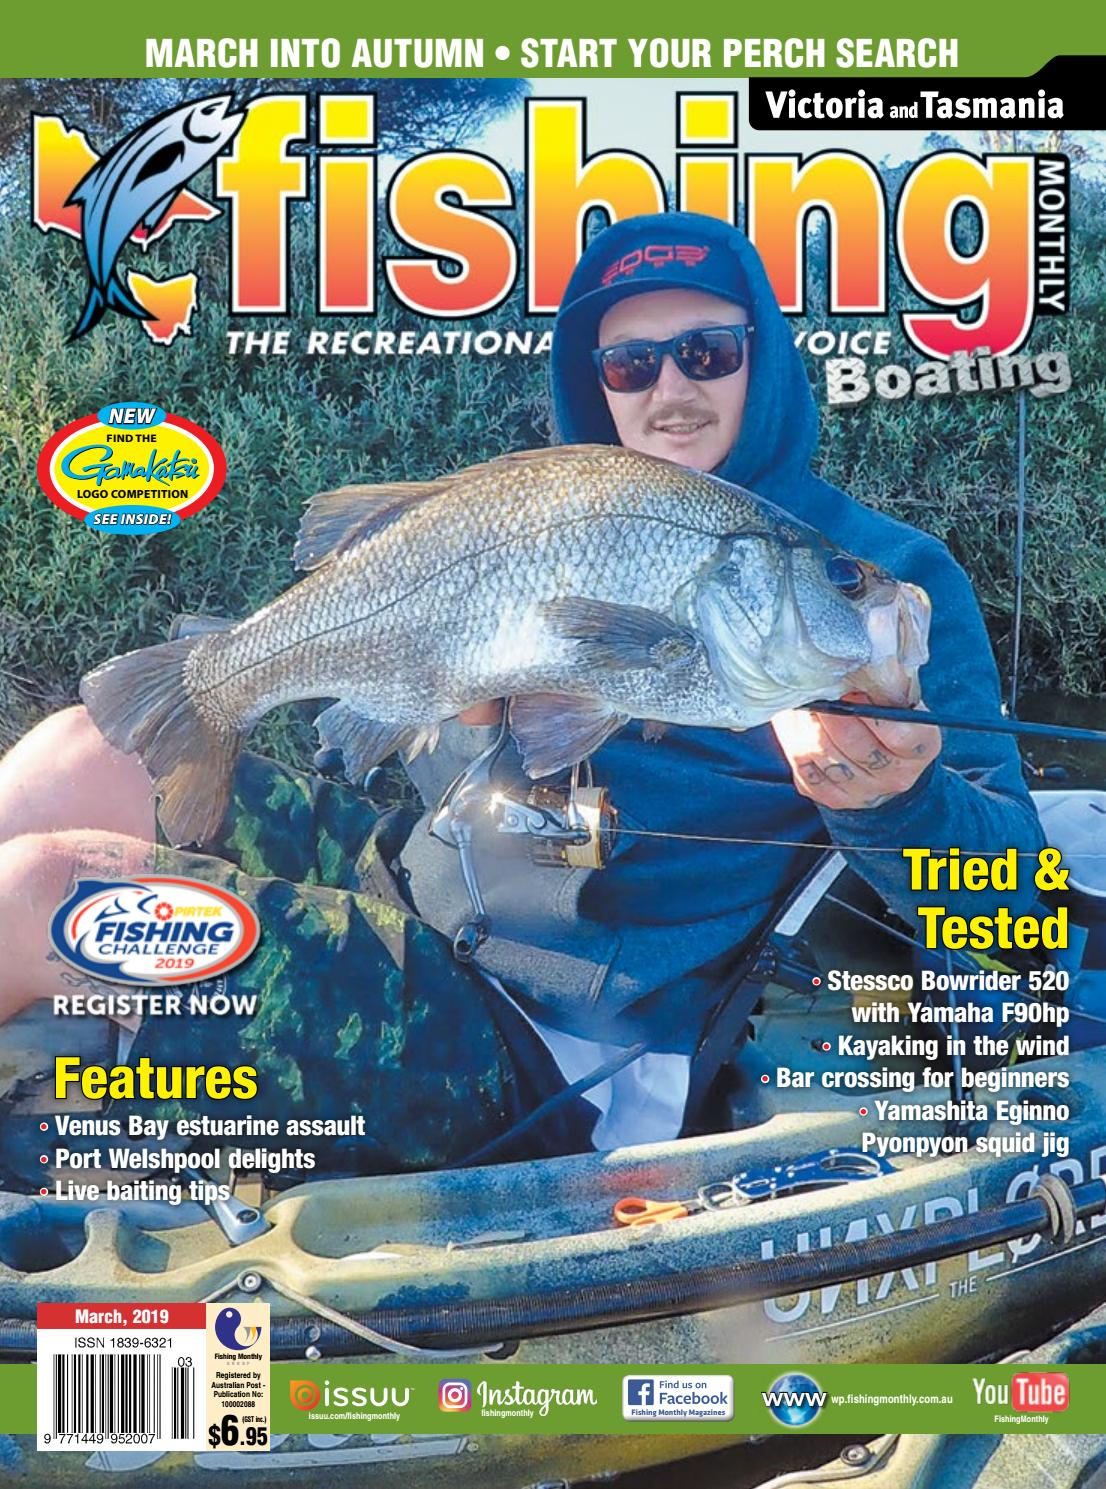 Carson River Sticker Fly Fish fishing decal GUARANTEE 3 yrs no fade